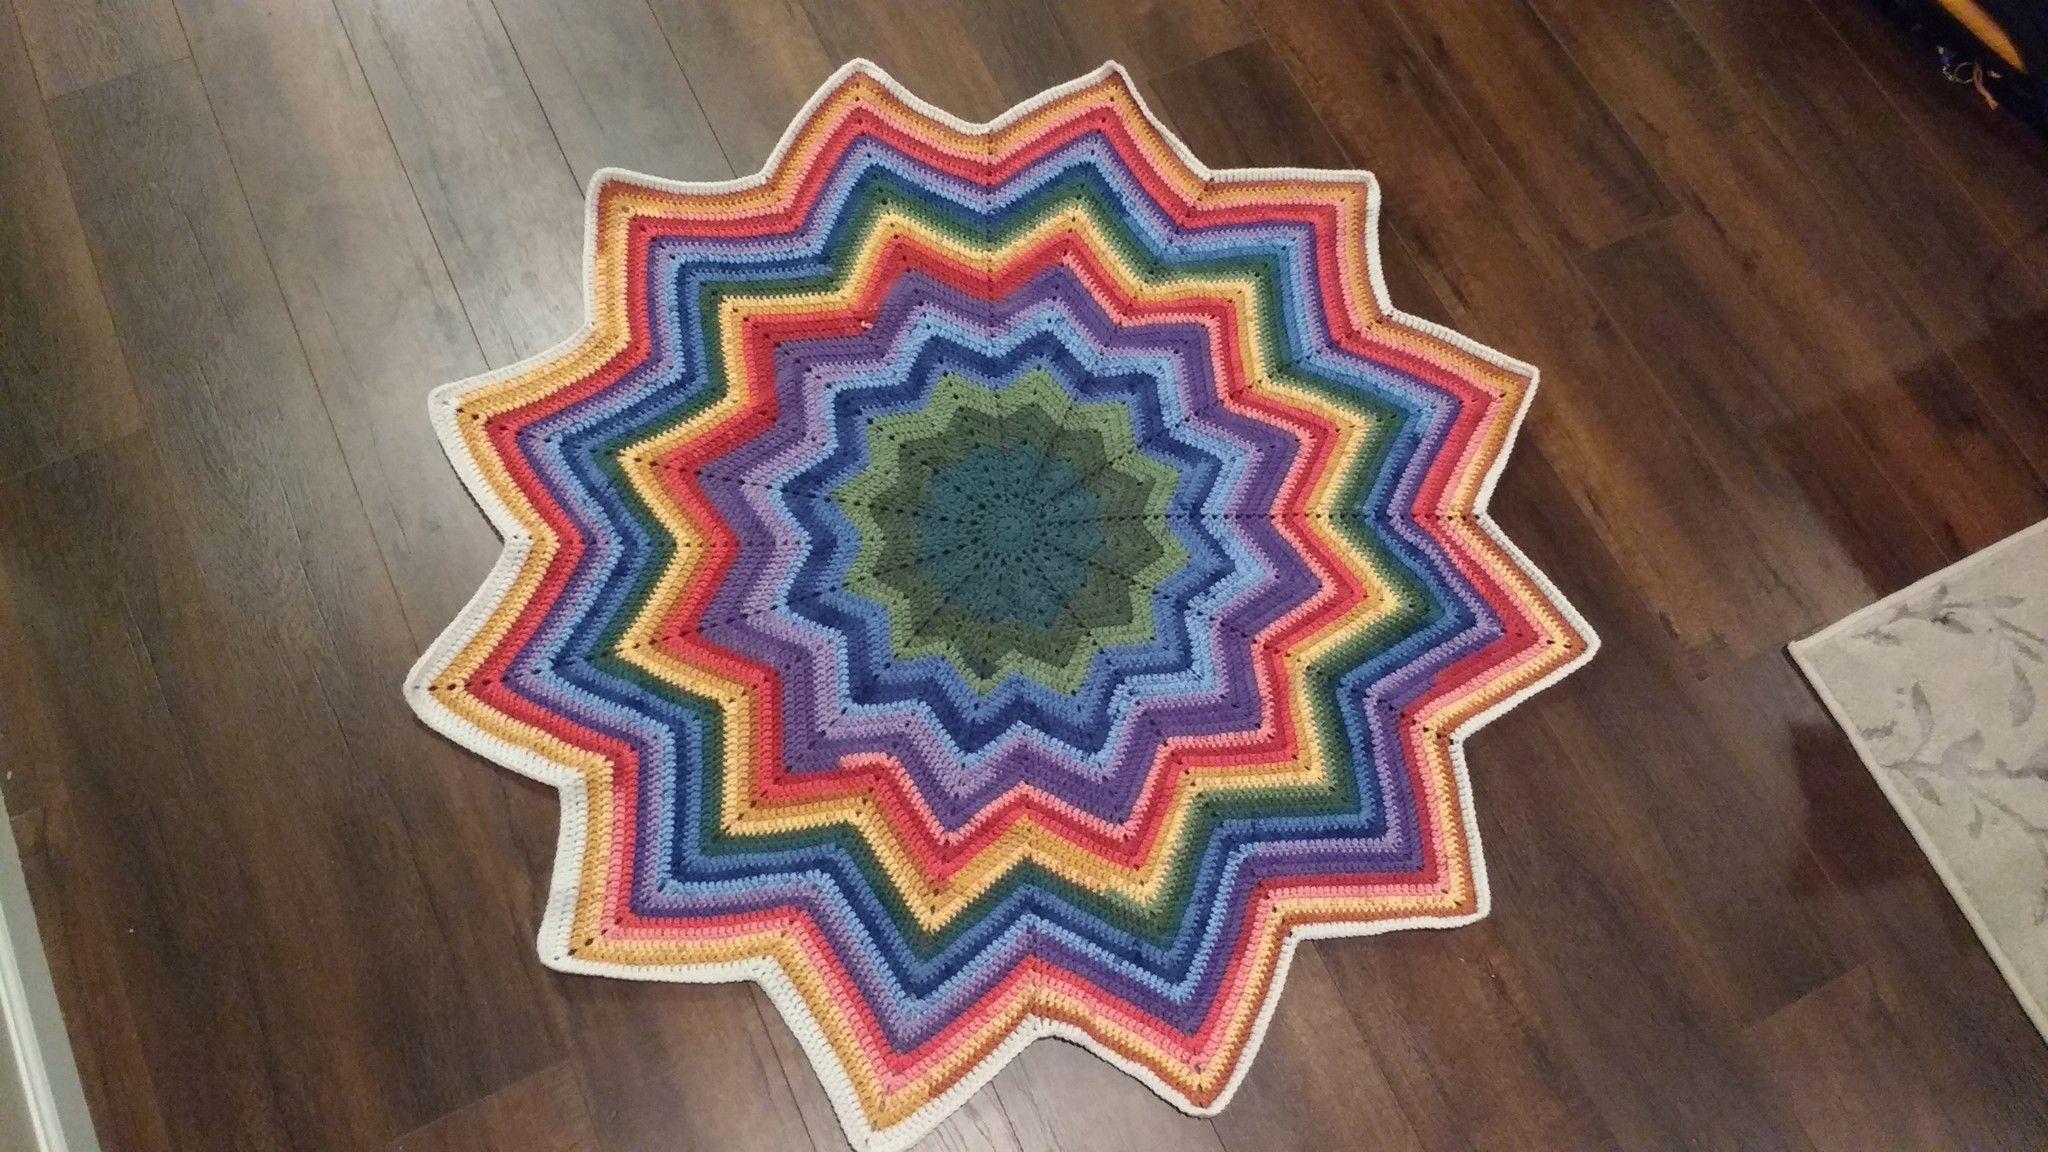 Crochet Star Blanket using Caron Cakes yarn to make rainbow | ideas ...